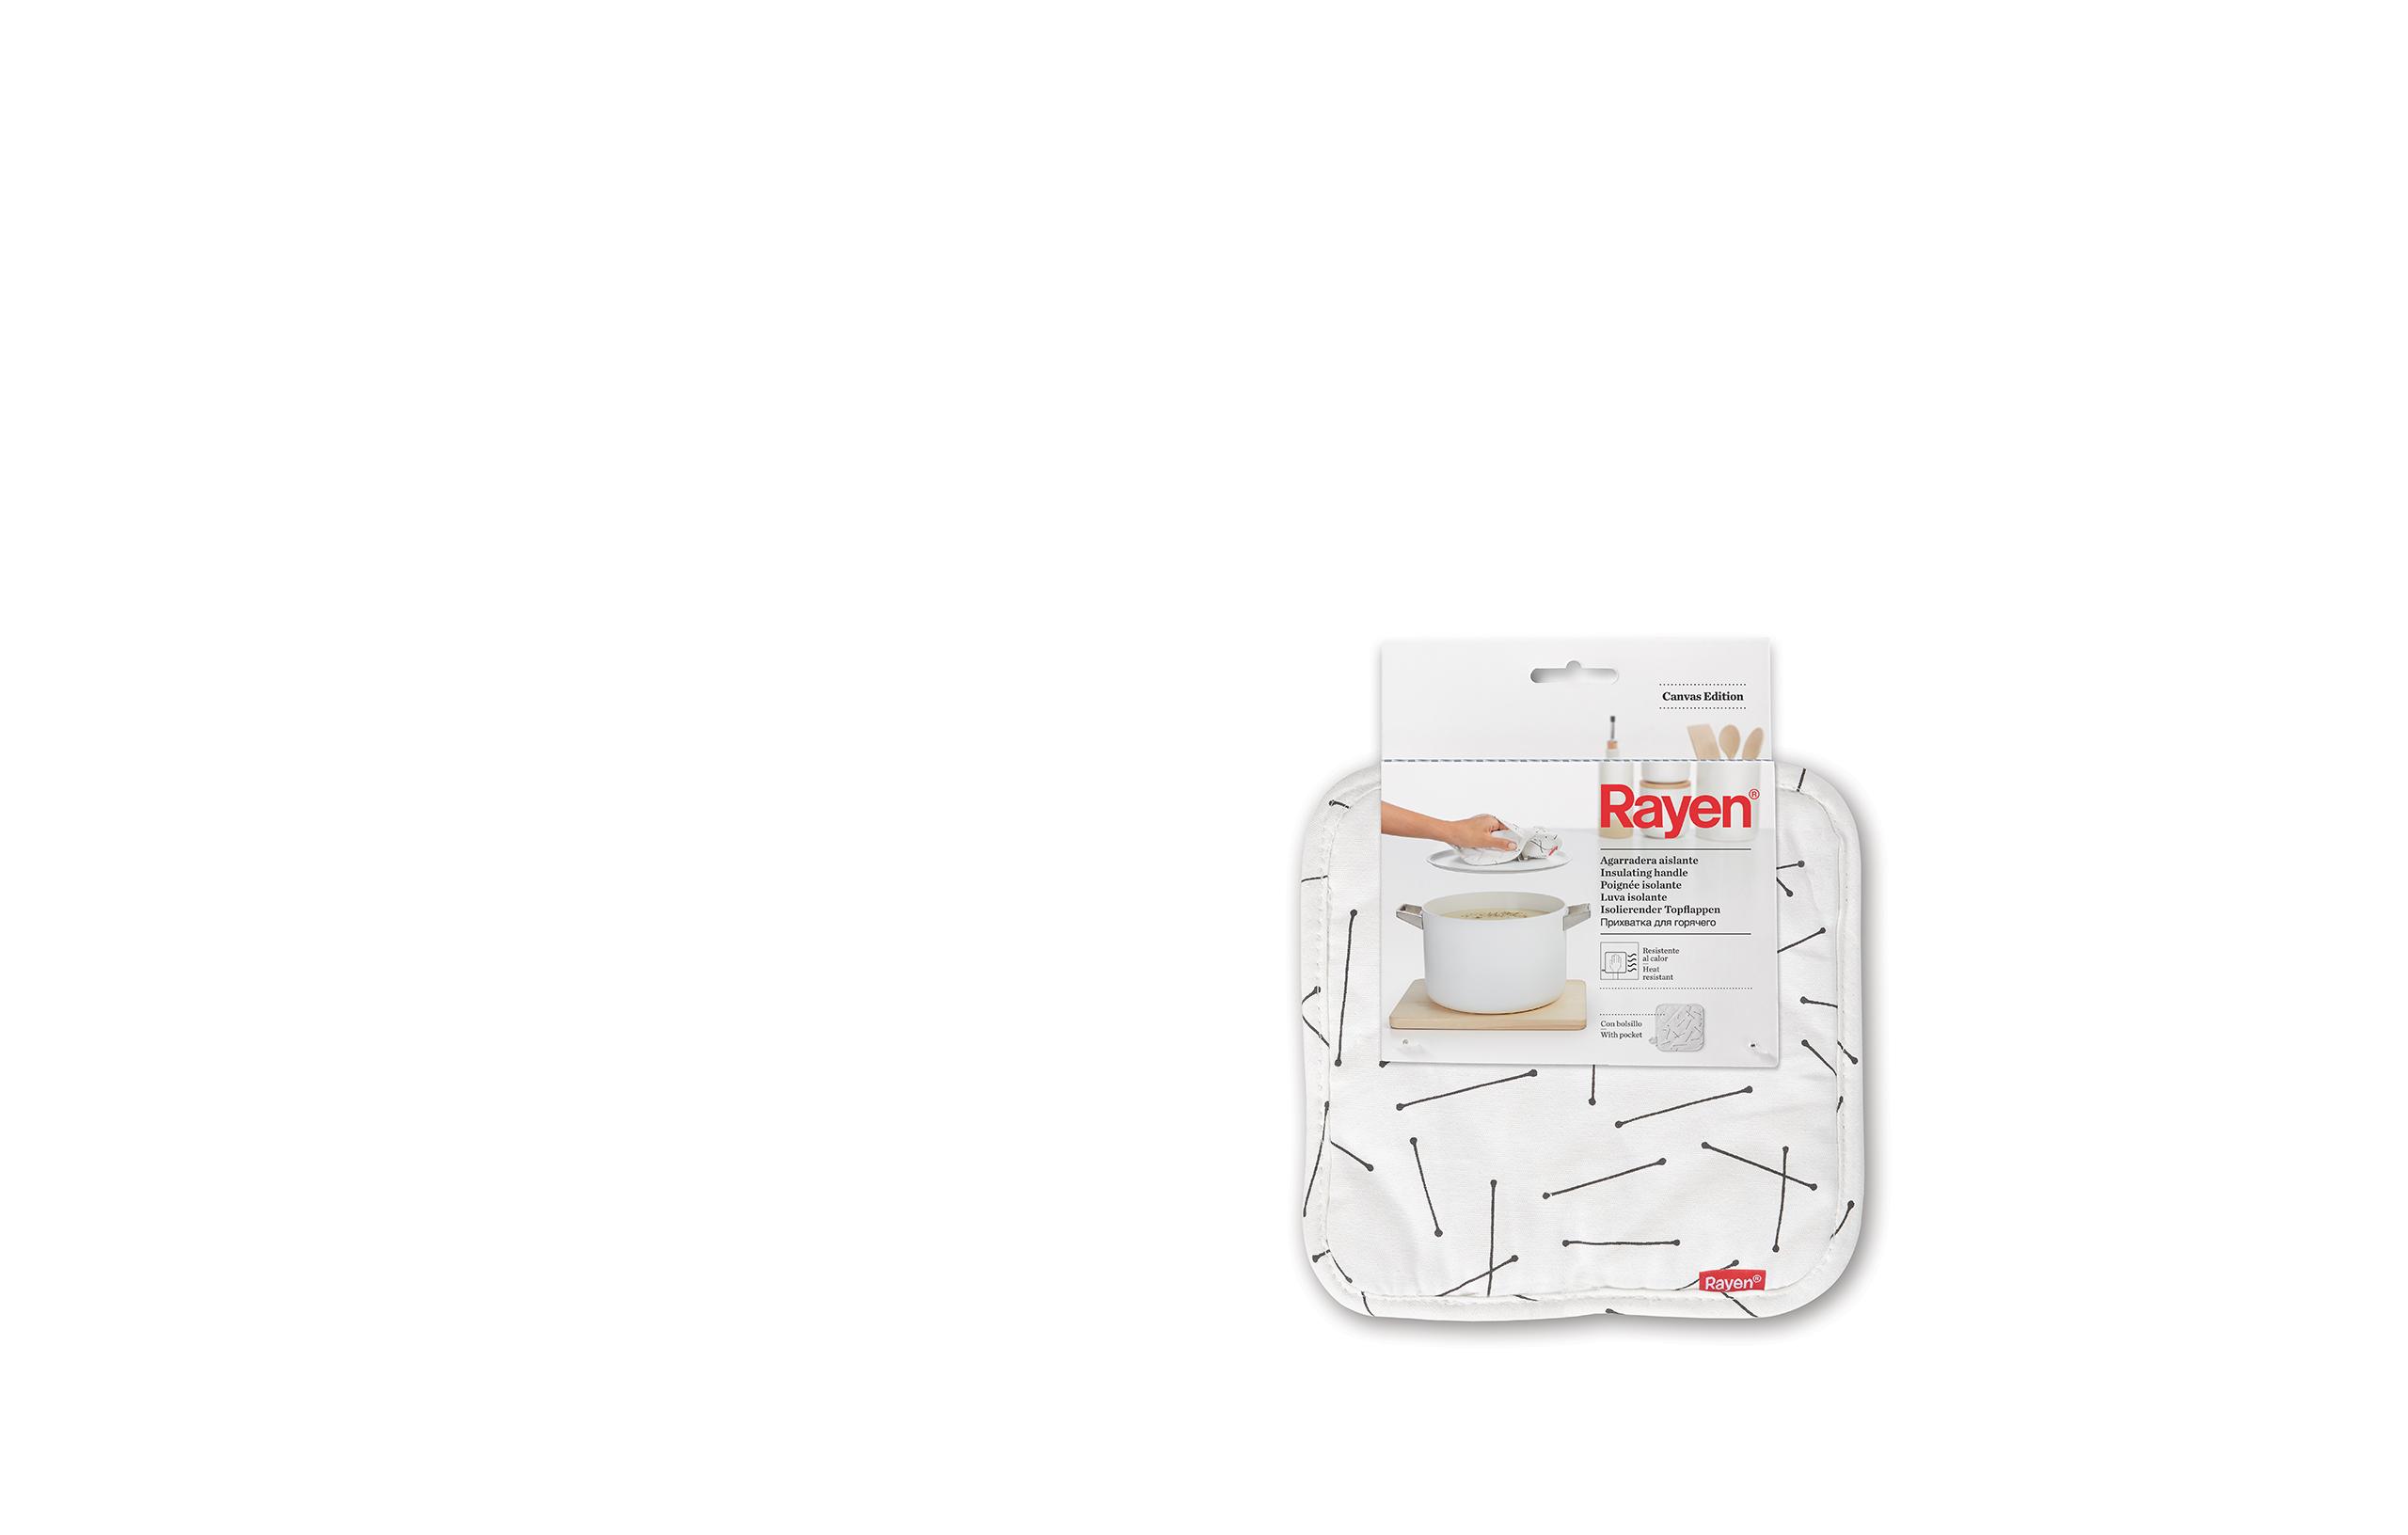 Rayen_Banner_Cocina_textil_12_Def Rayen_Banner_Cocina_textil_12_Def | Rayen.com